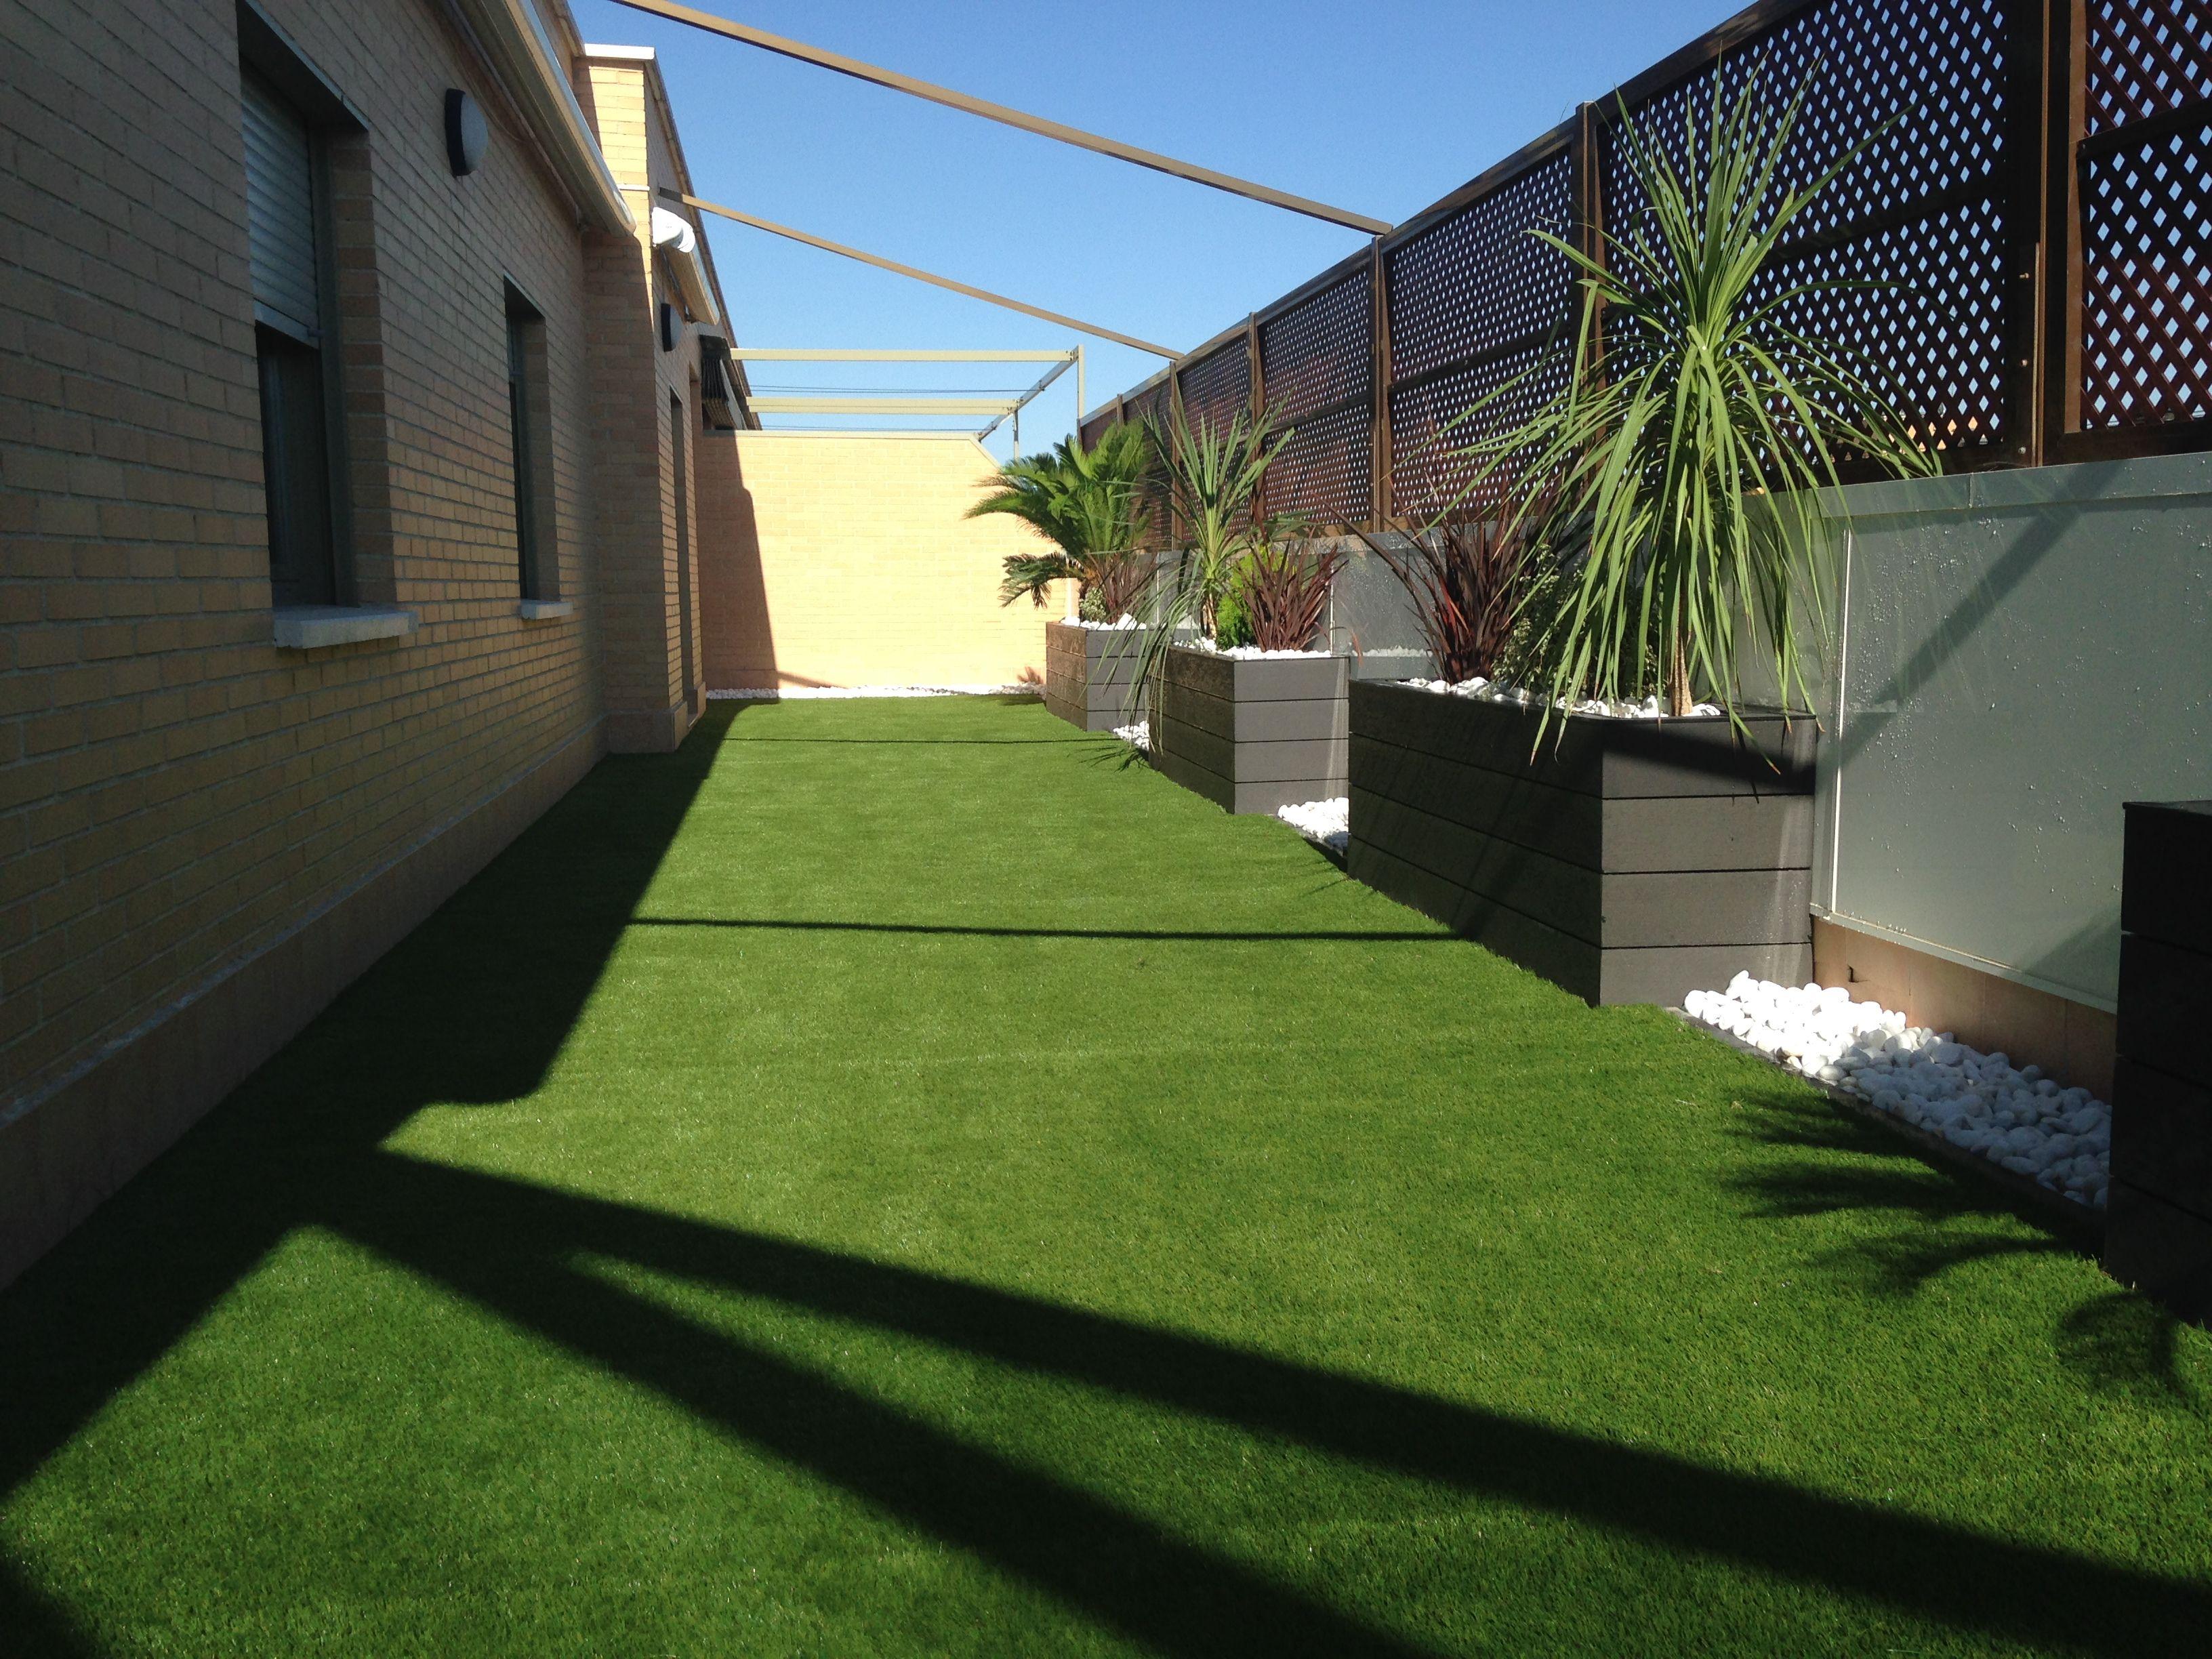 Dise o de terraza con c sped artificial y tarima sint tica - Tarima para terraza ...